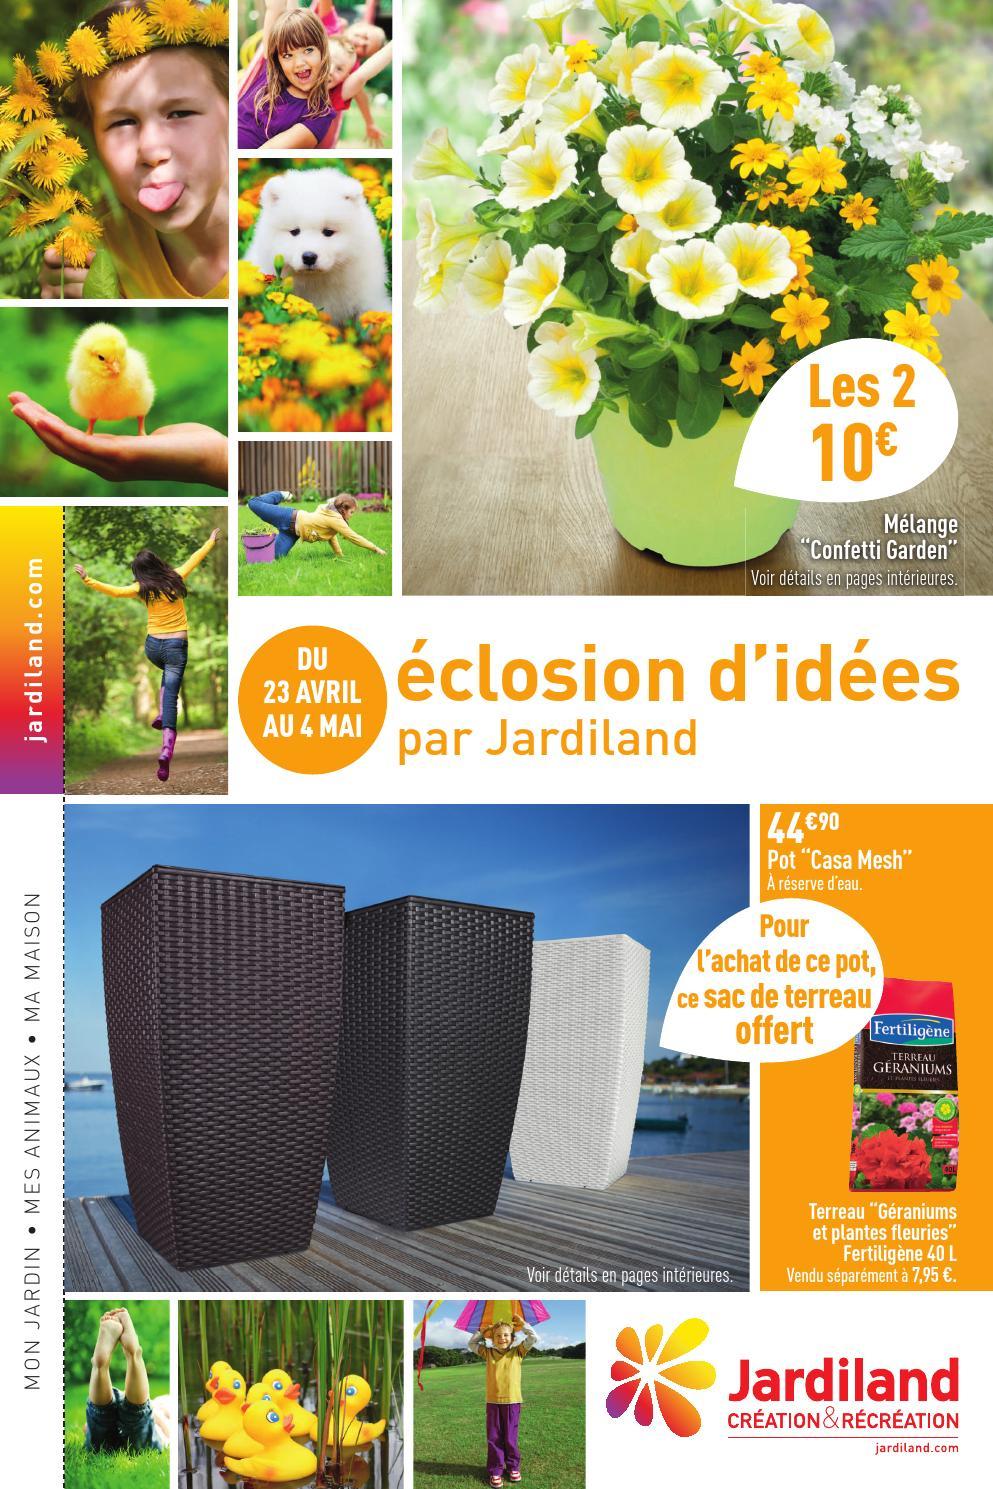 Catalogue Jardiland - 23.04-4.05.2014 By Joe Monroe - Issuu intérieur Chariot De Jardin Jardiland